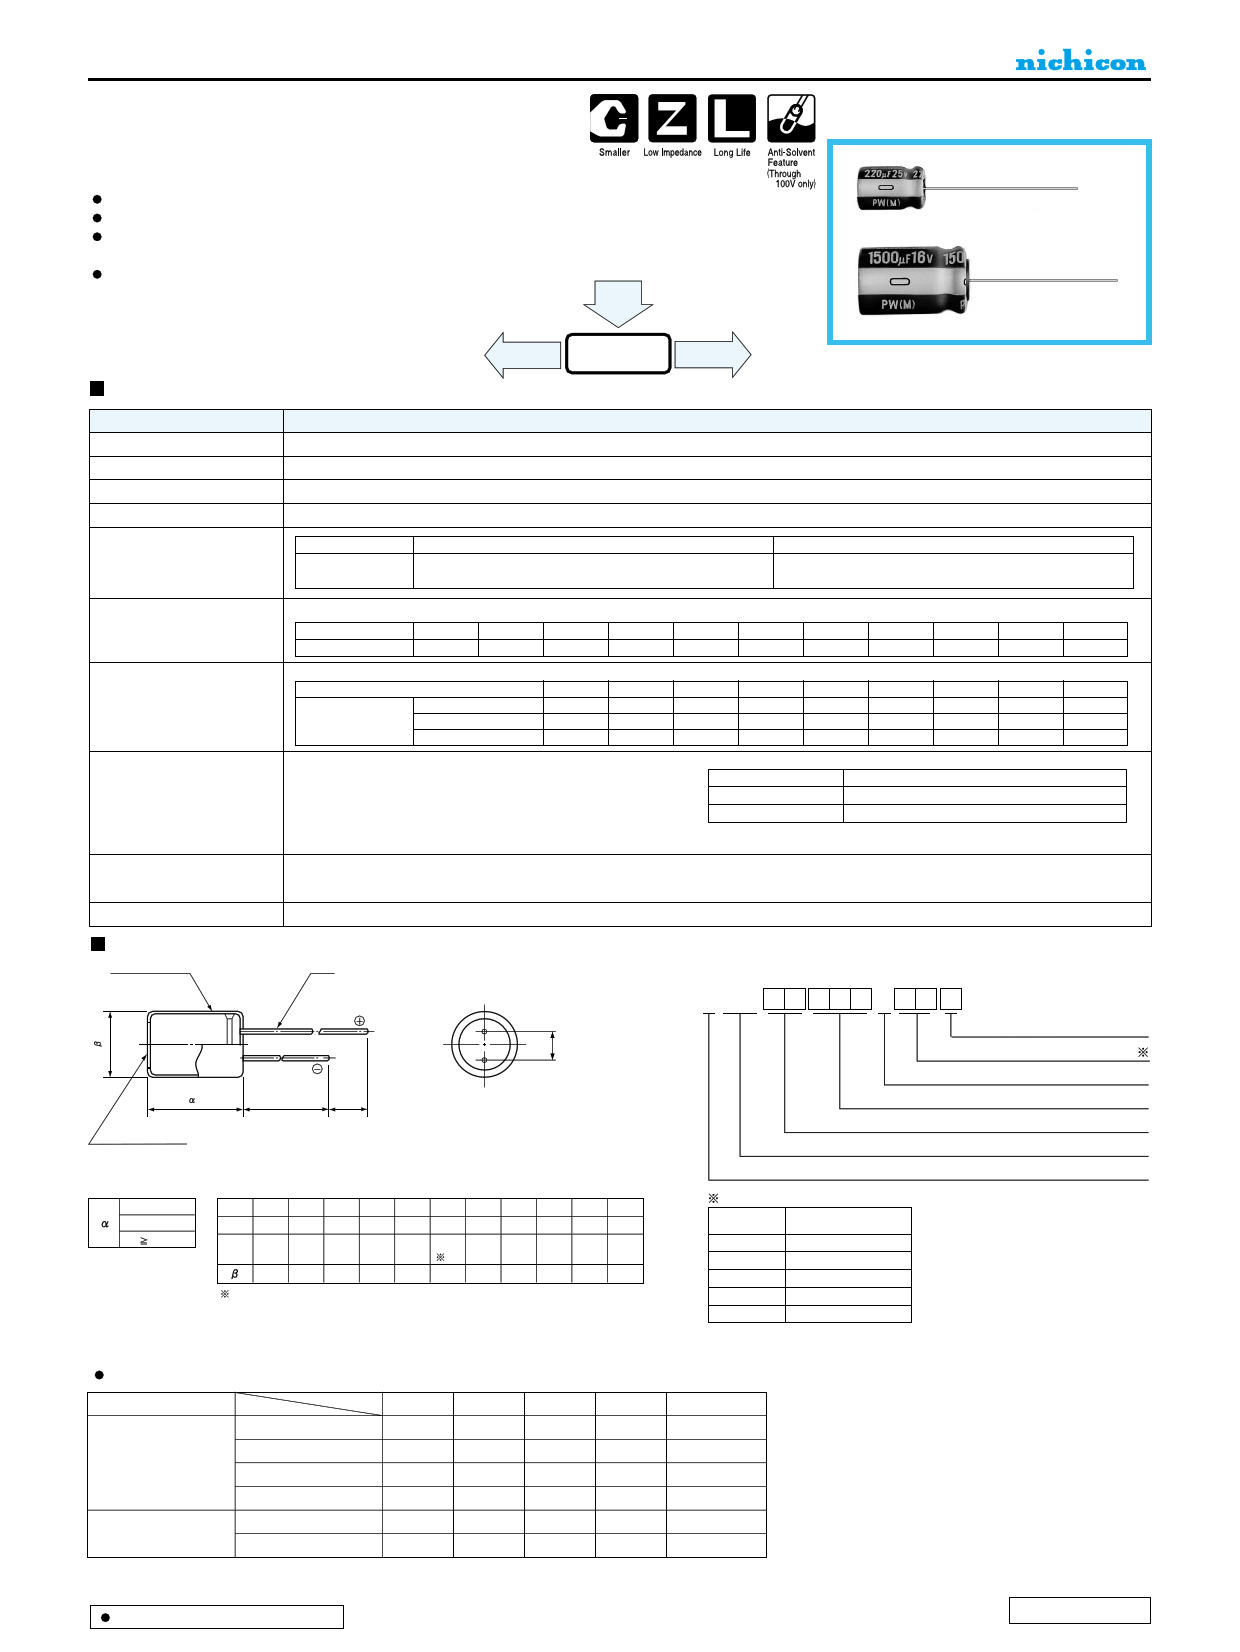 UPW1H152MHD 데이터시트 및 UPW1H152MHD PDF